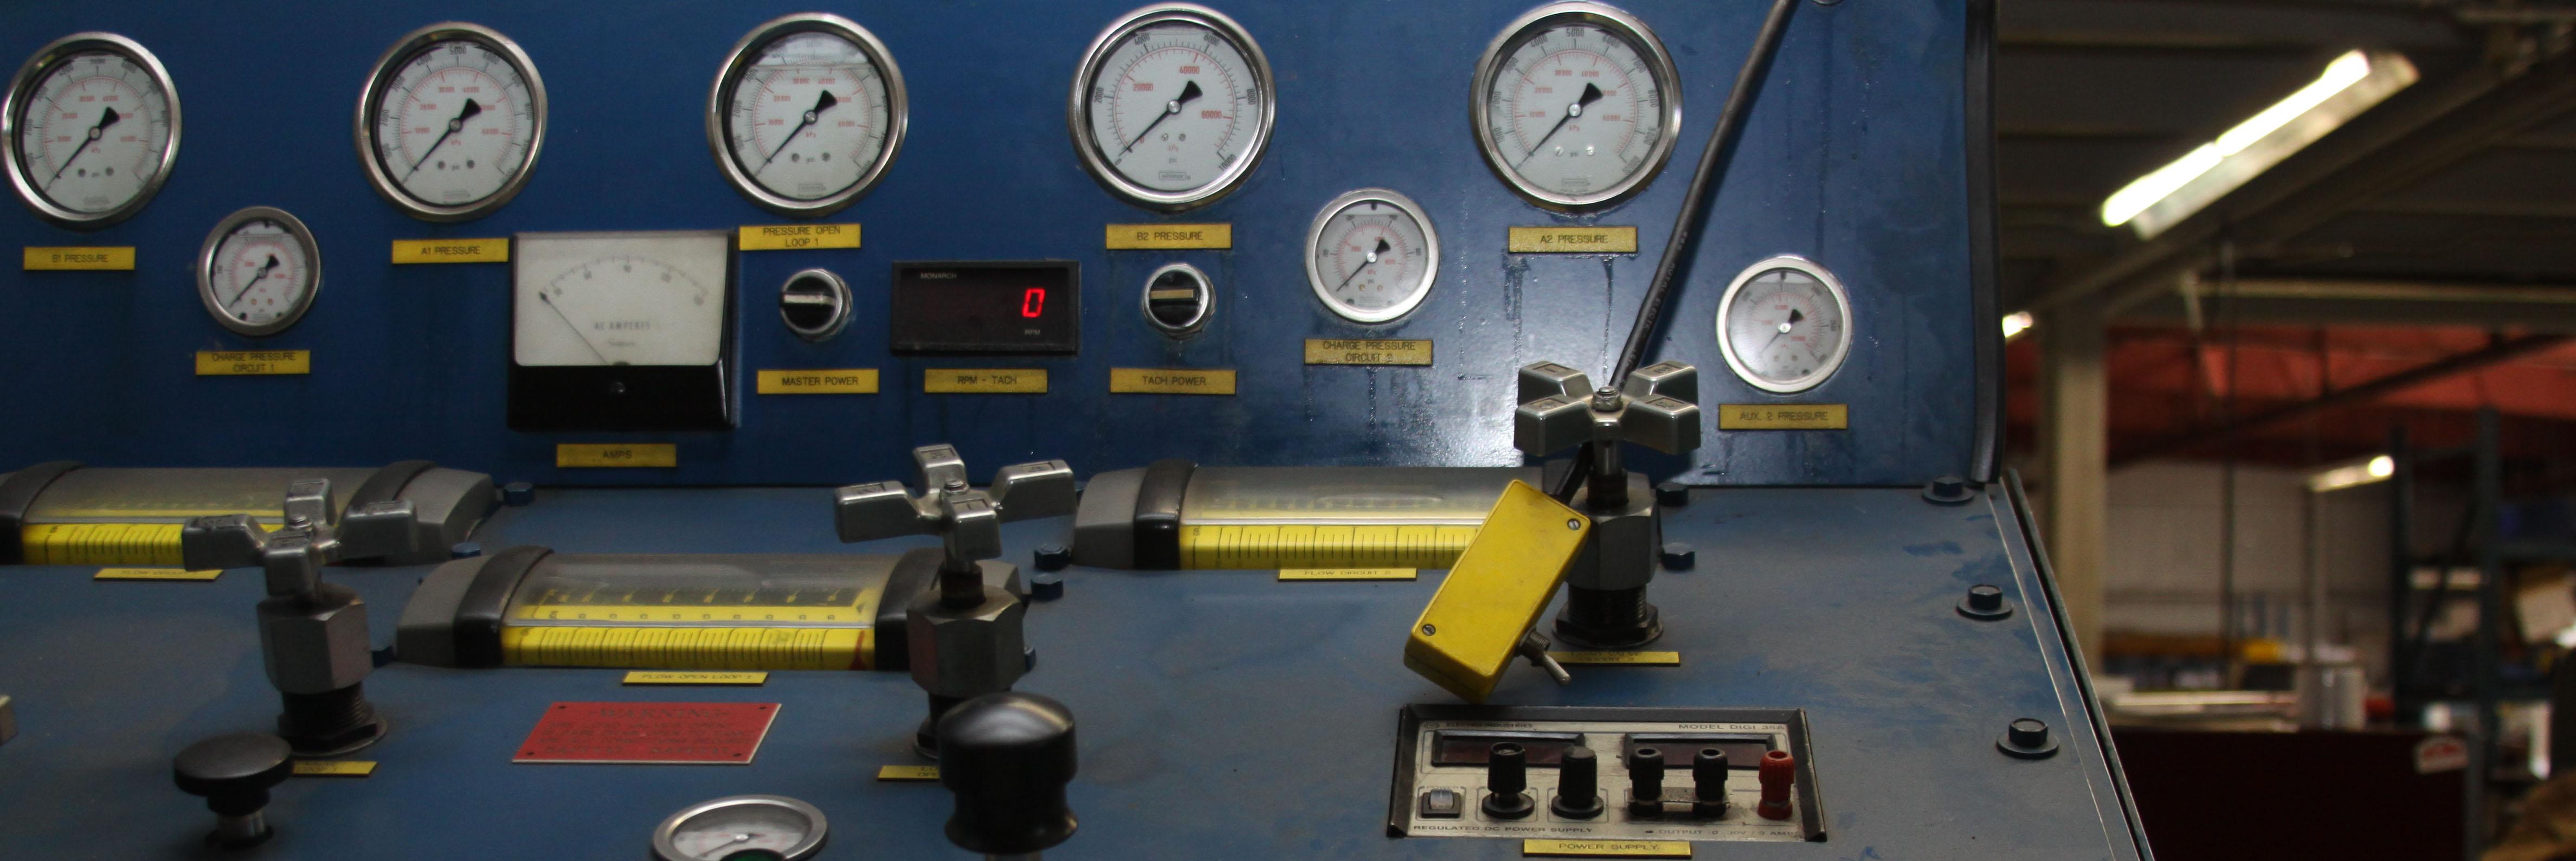 heavy duty hydraulics machinery